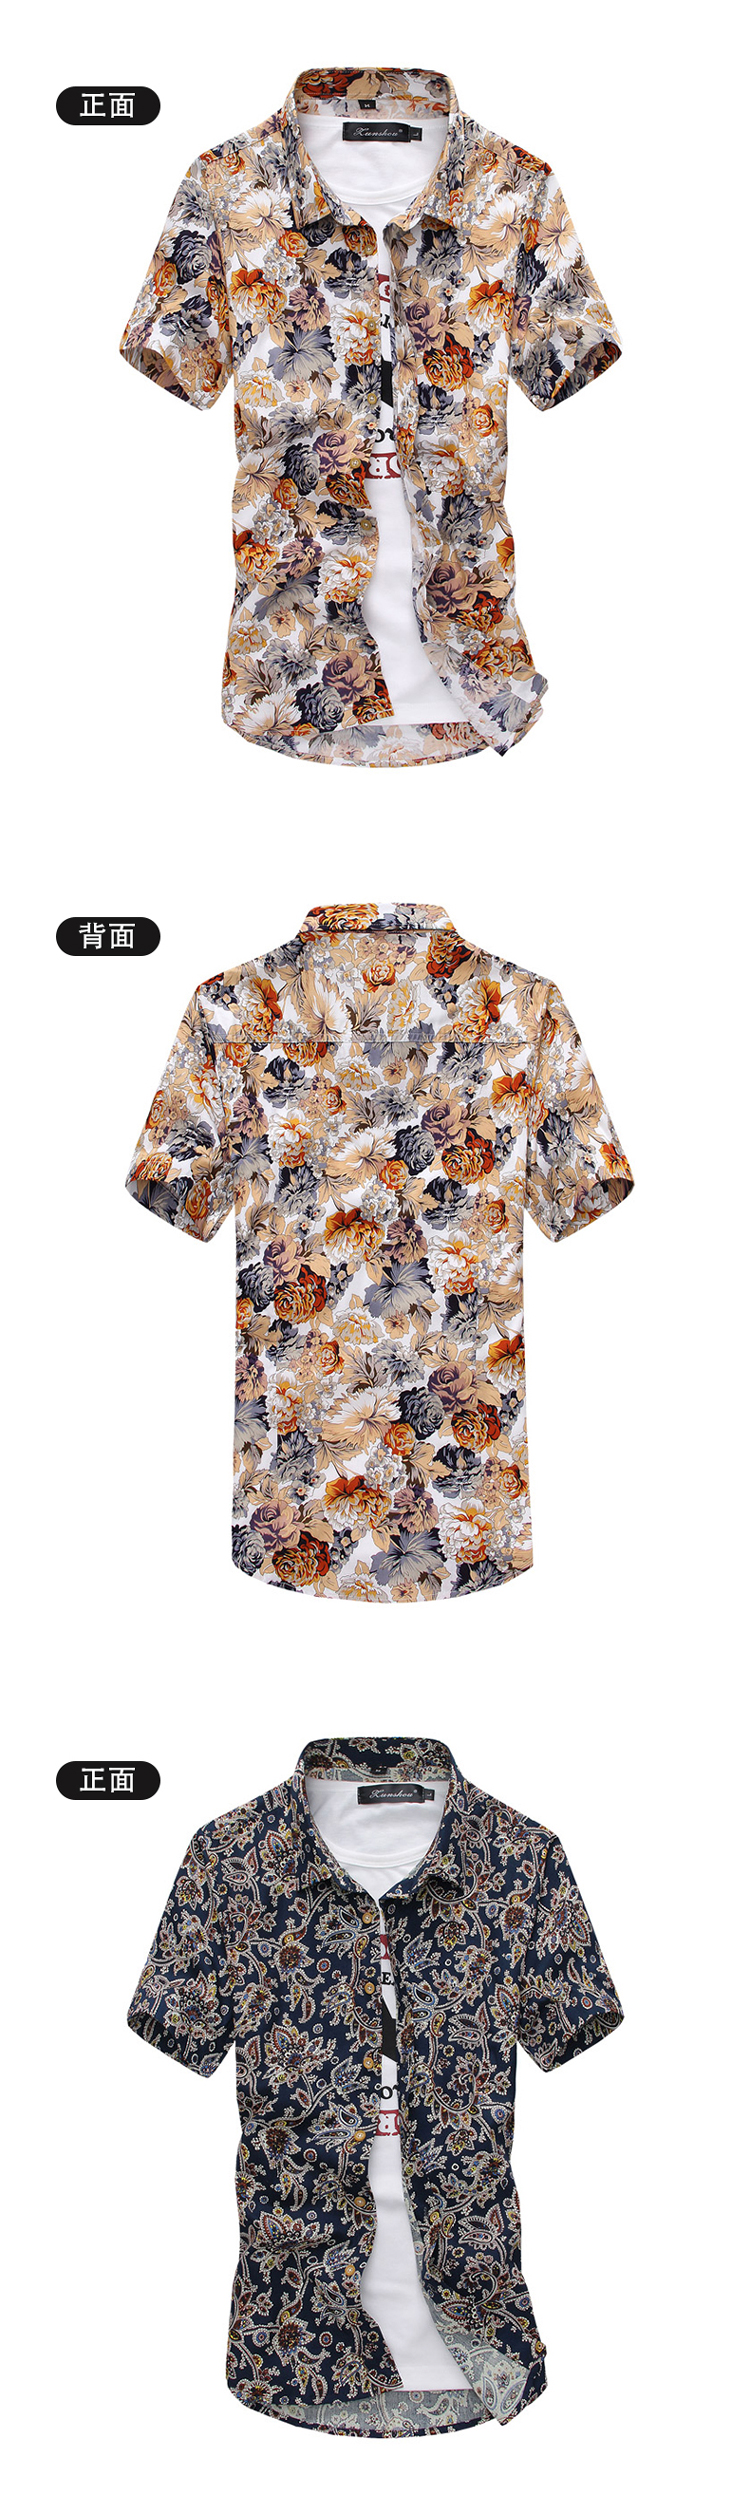 Men Summer Thin Shirts Short Sleeve Floral Shirts New Fashion Men Outwear Casual Slim Shirts Mens Cotton dress shirts 8